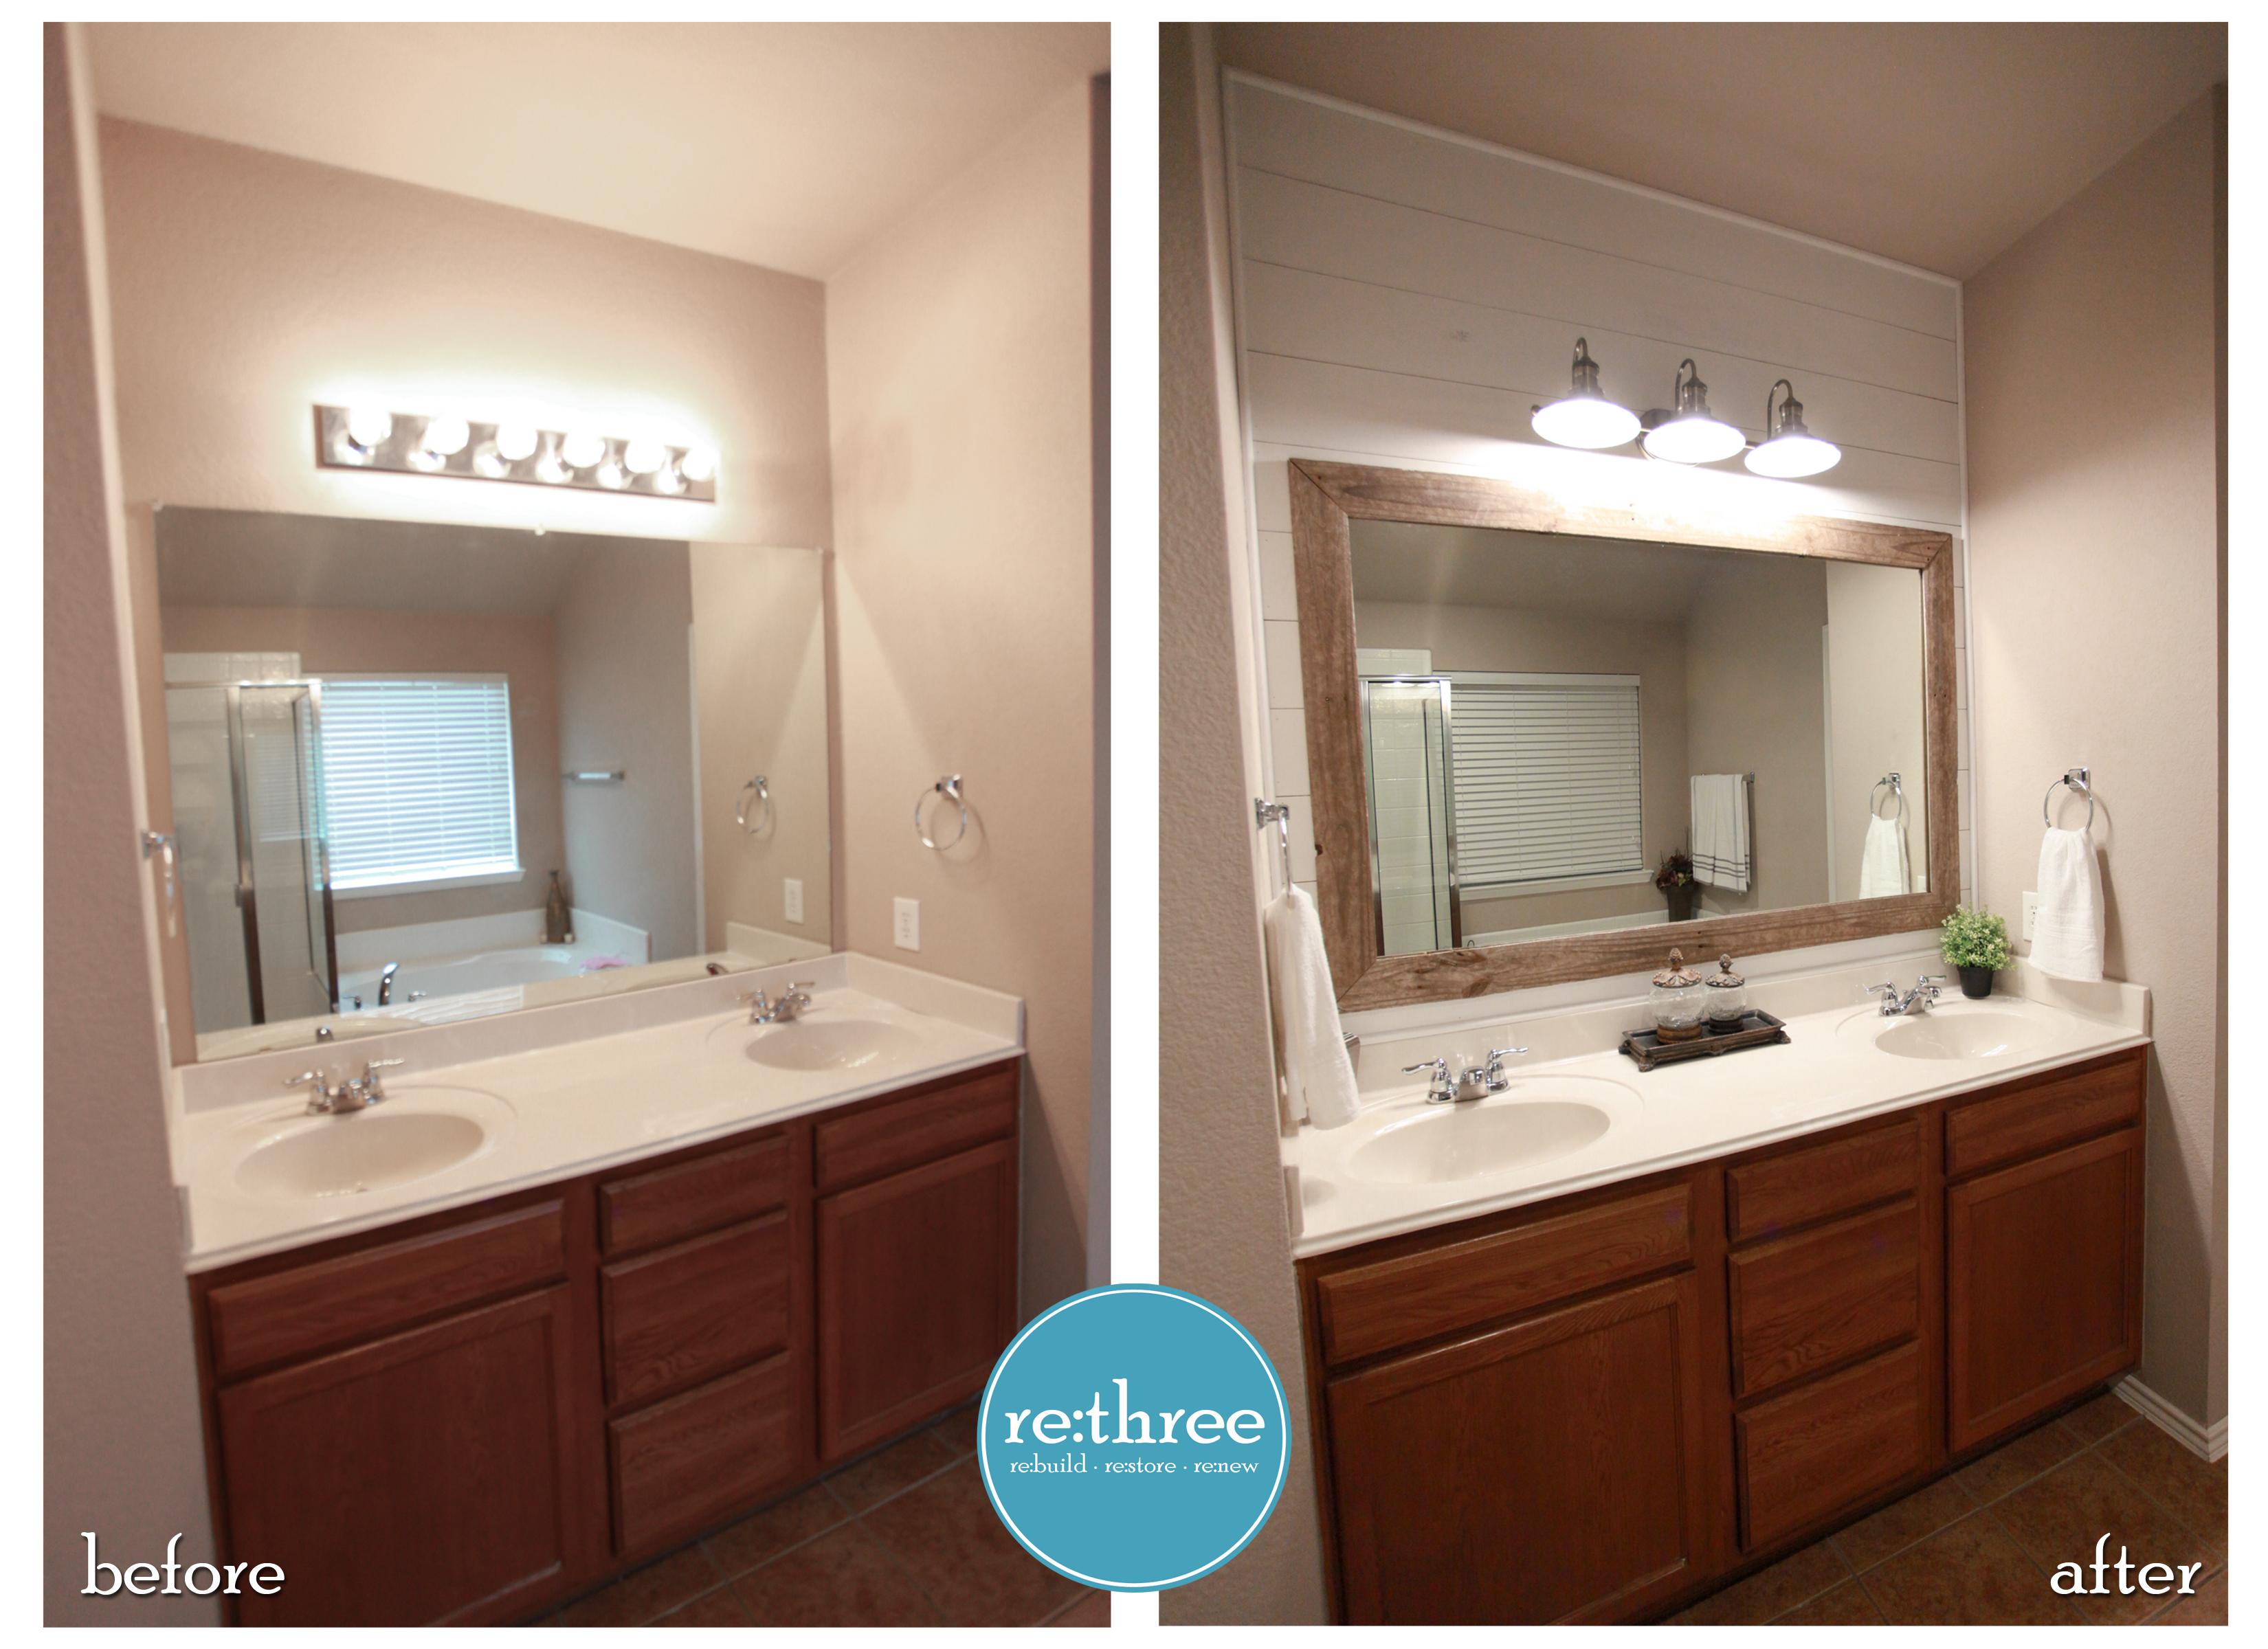 Farmhouse Bathroom Remodel With Shiplap Backsplash And Reclaimed Wood Framed Mirror Modern Backsplash Stone Backsplash Kitchen Cheap Backsplash Tile